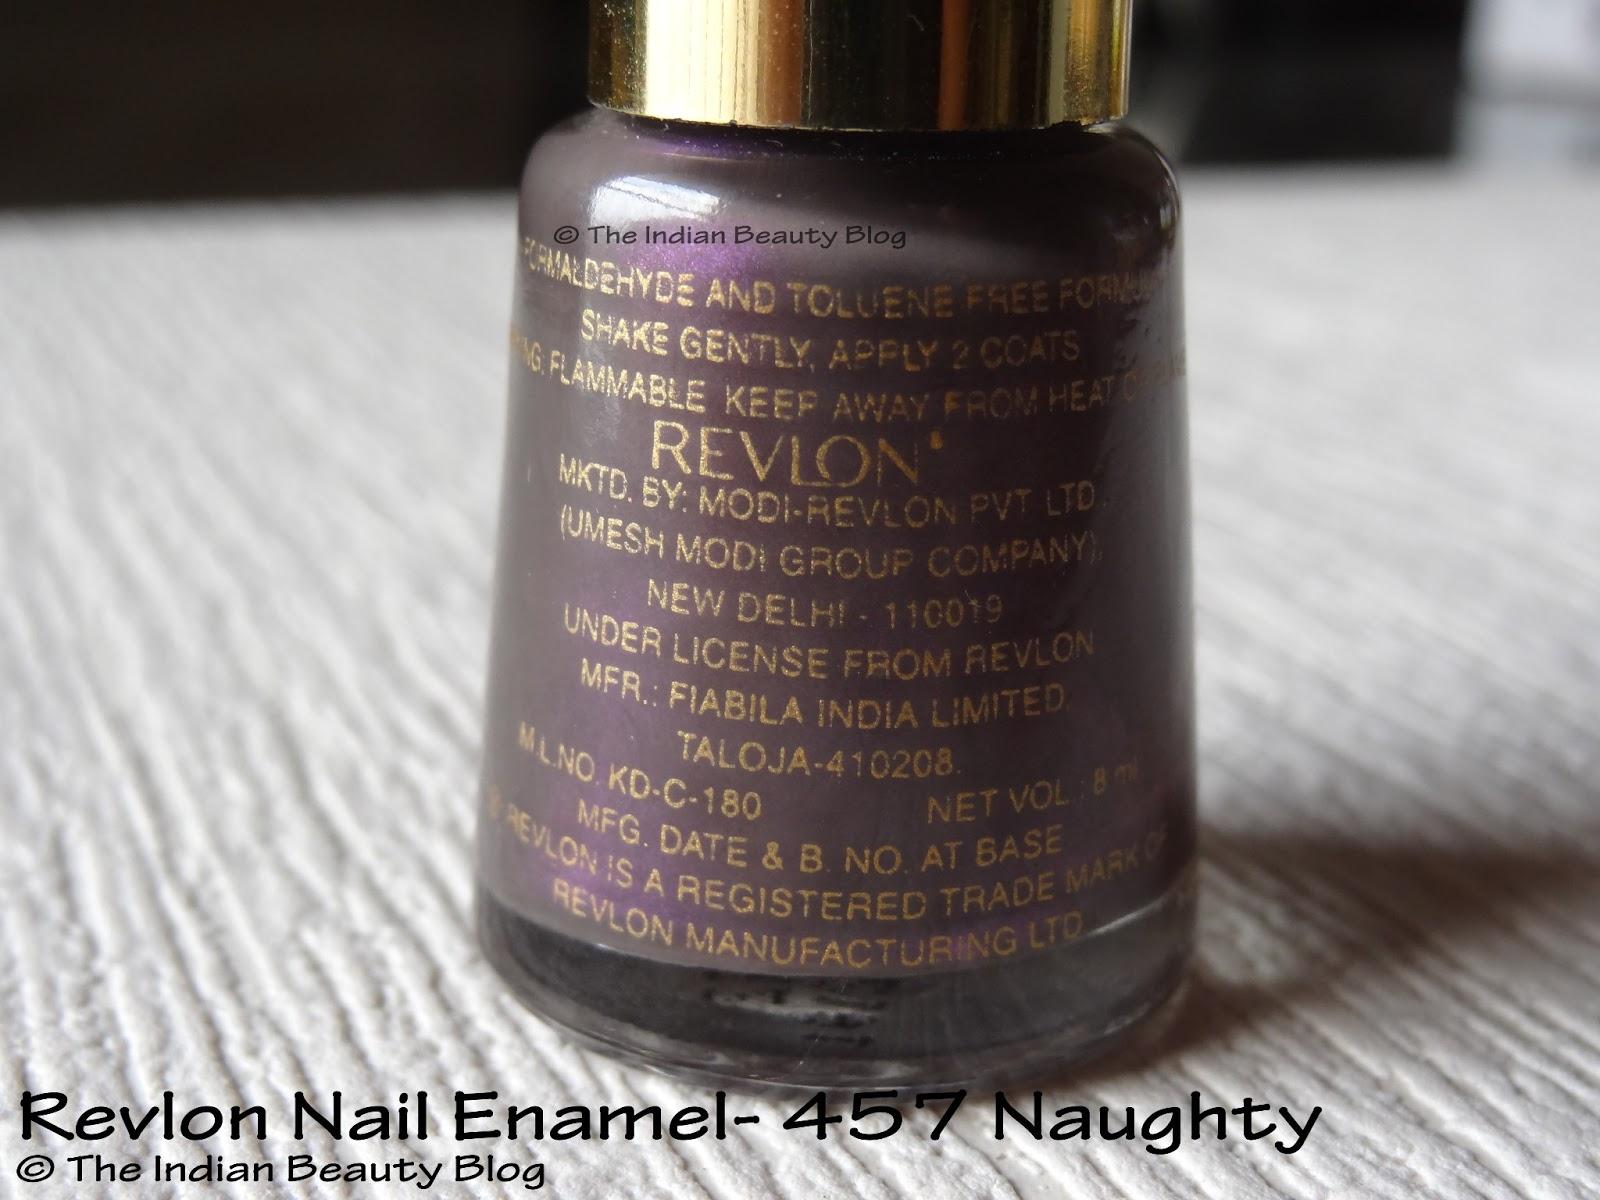 Revlon Nail Enamel- 457 \'Naughty\': Review, NOTD - The Indian Beauty Blog